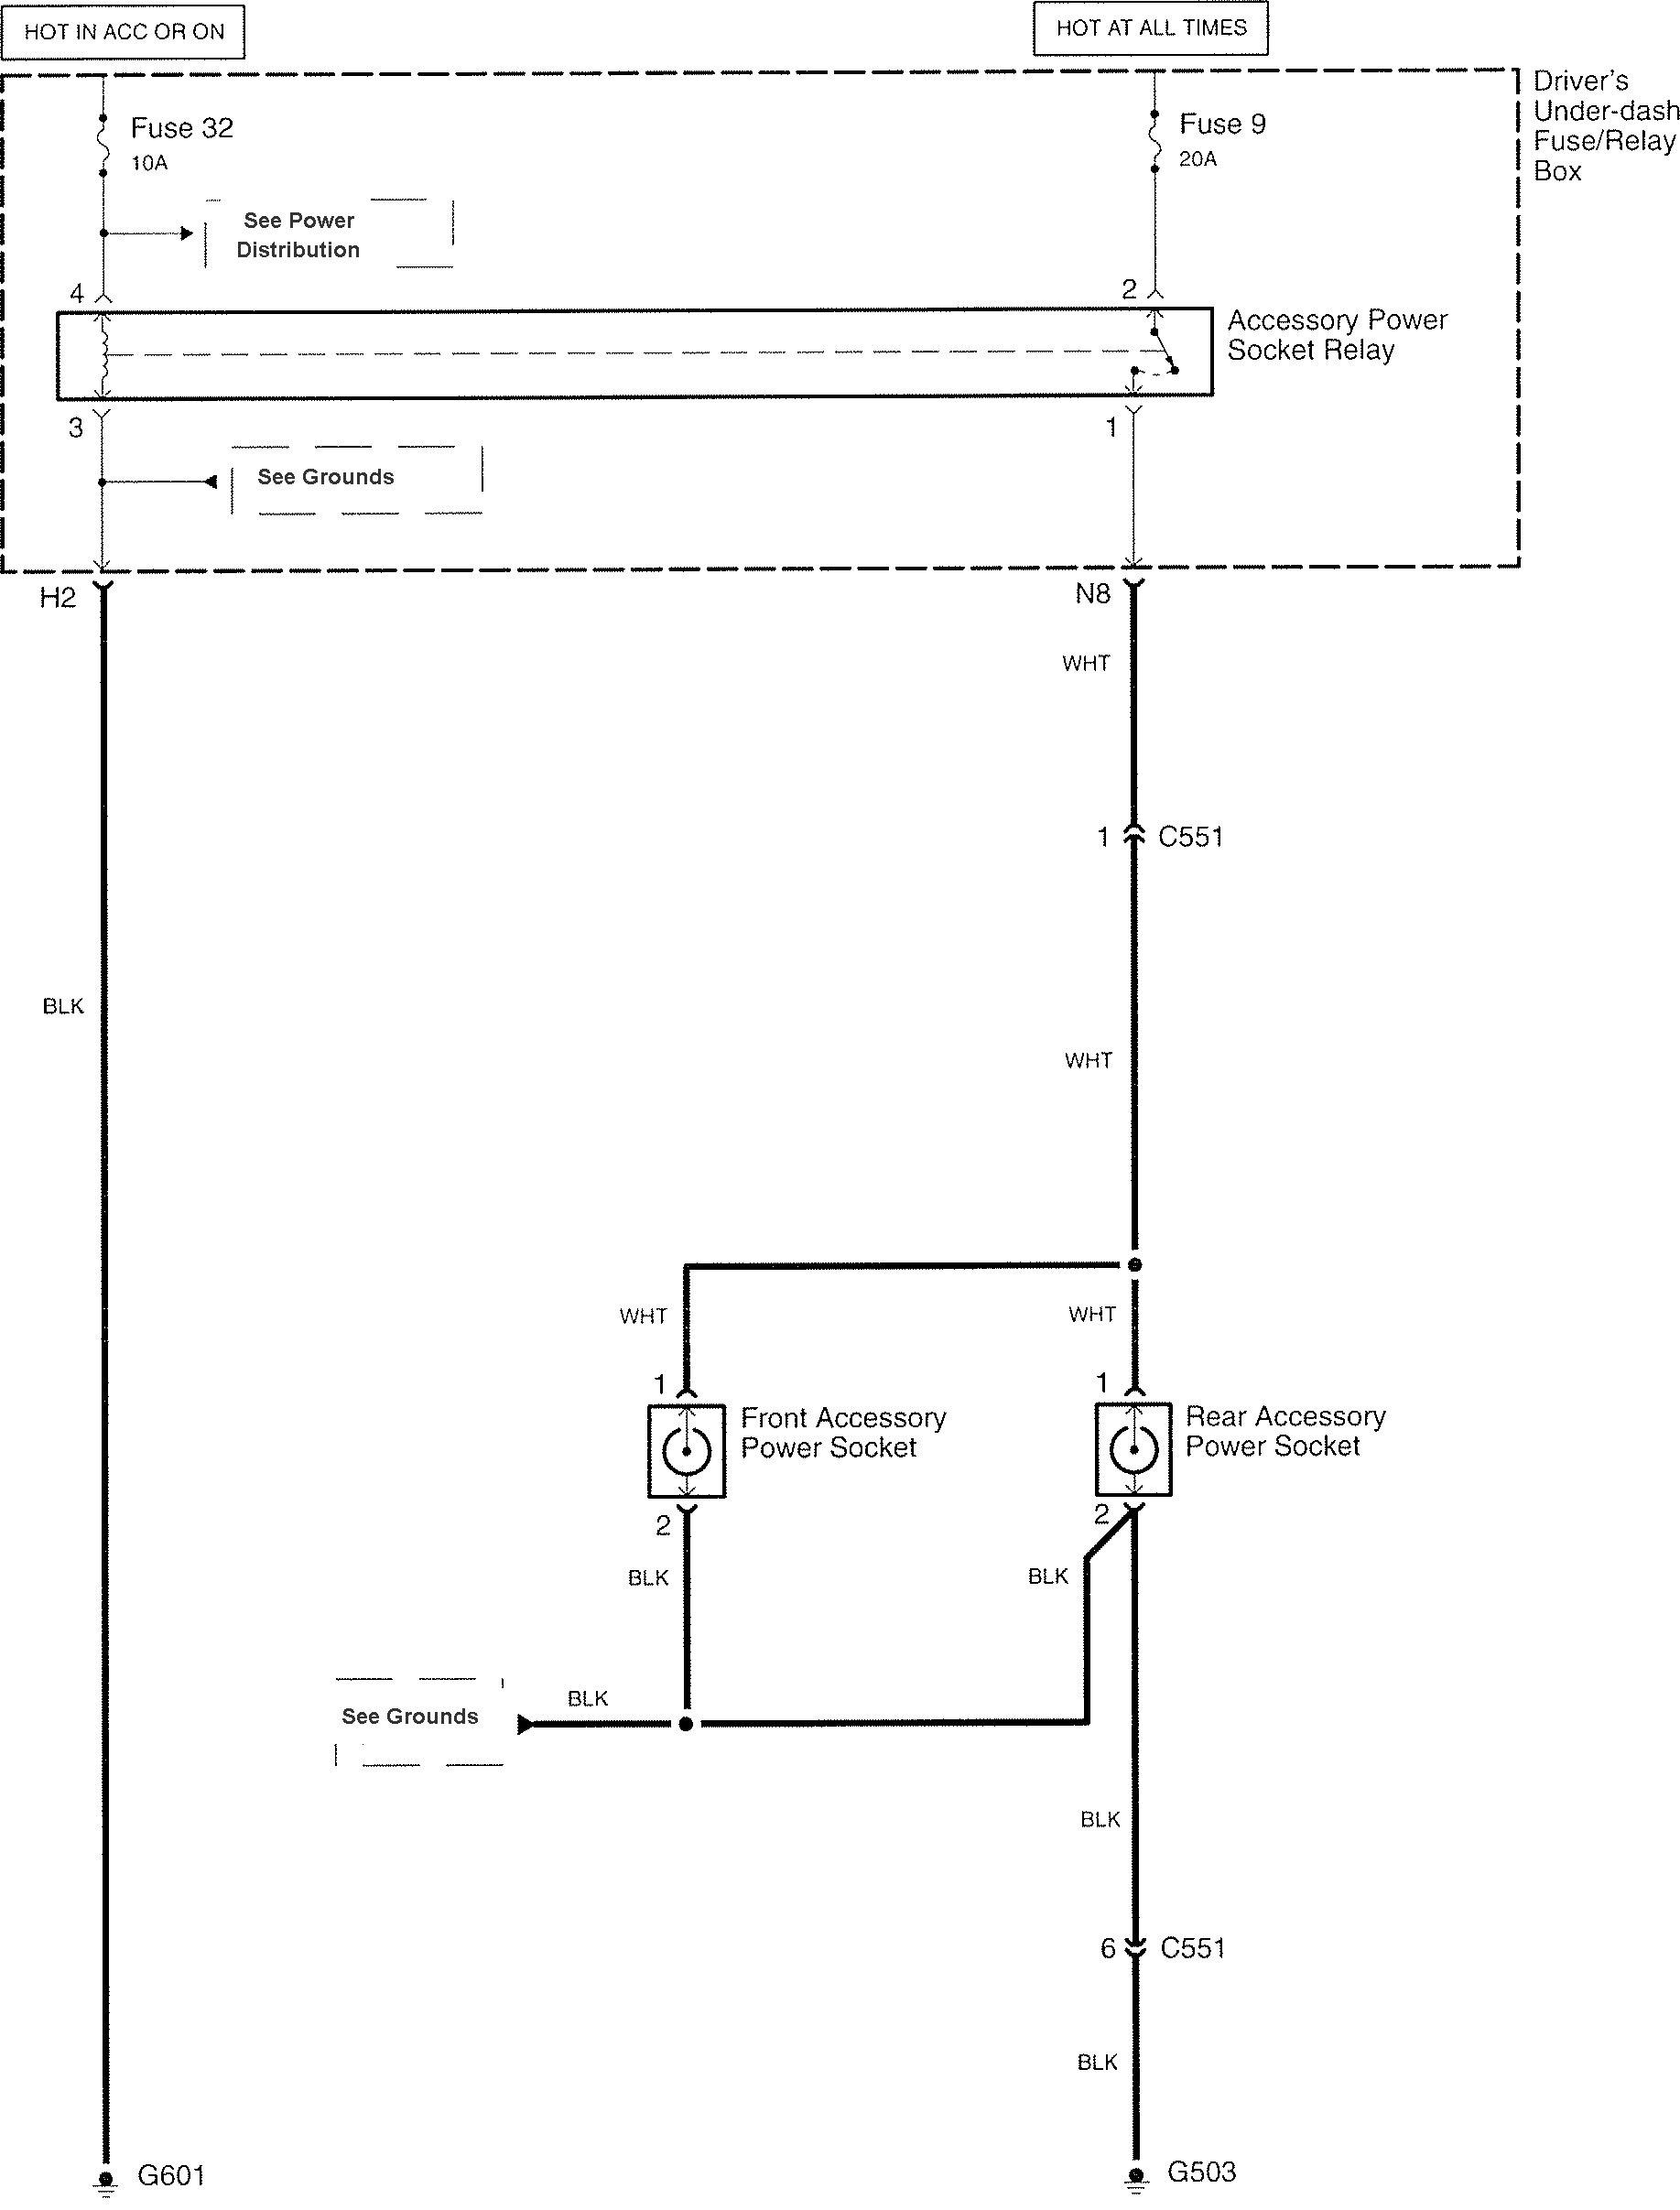 Diagram 2009 Acura Mdx Ac Diagram Wiring Schematic Full Version Hd Quality Wiring Schematic Painfreedrop Blidetoine Fr